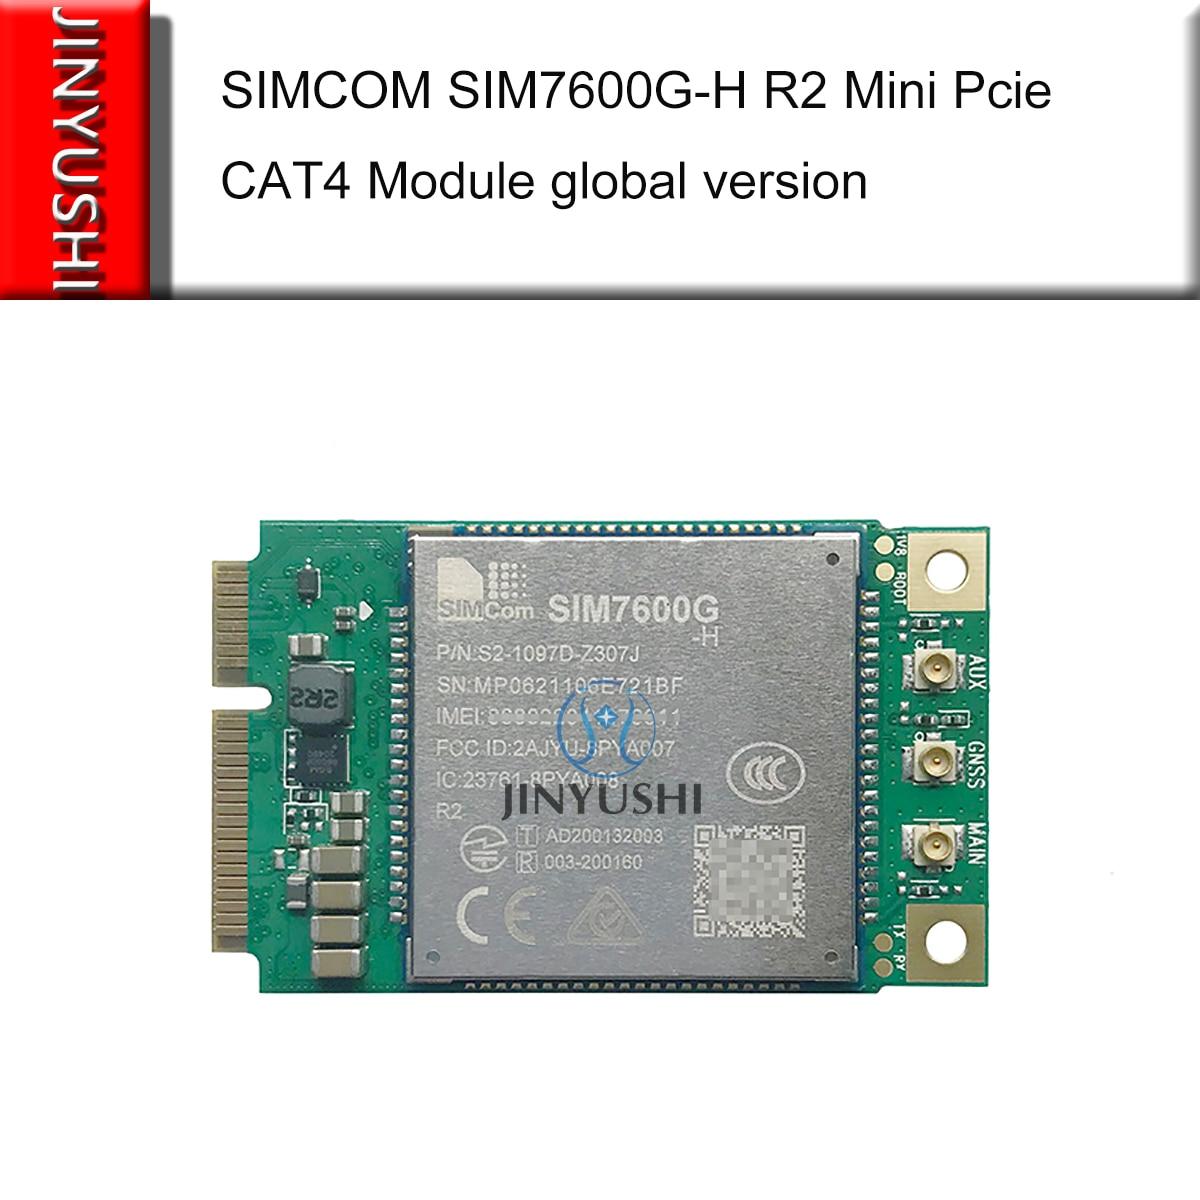 SIMCOM SIM7600G-H R2 البسيطة بكيي 4G LTE CAT4 وحدة العالمية النسخة استبدال SIM7600E-H SIM7600SA-H SIM7600JC-H SIM7600A-H